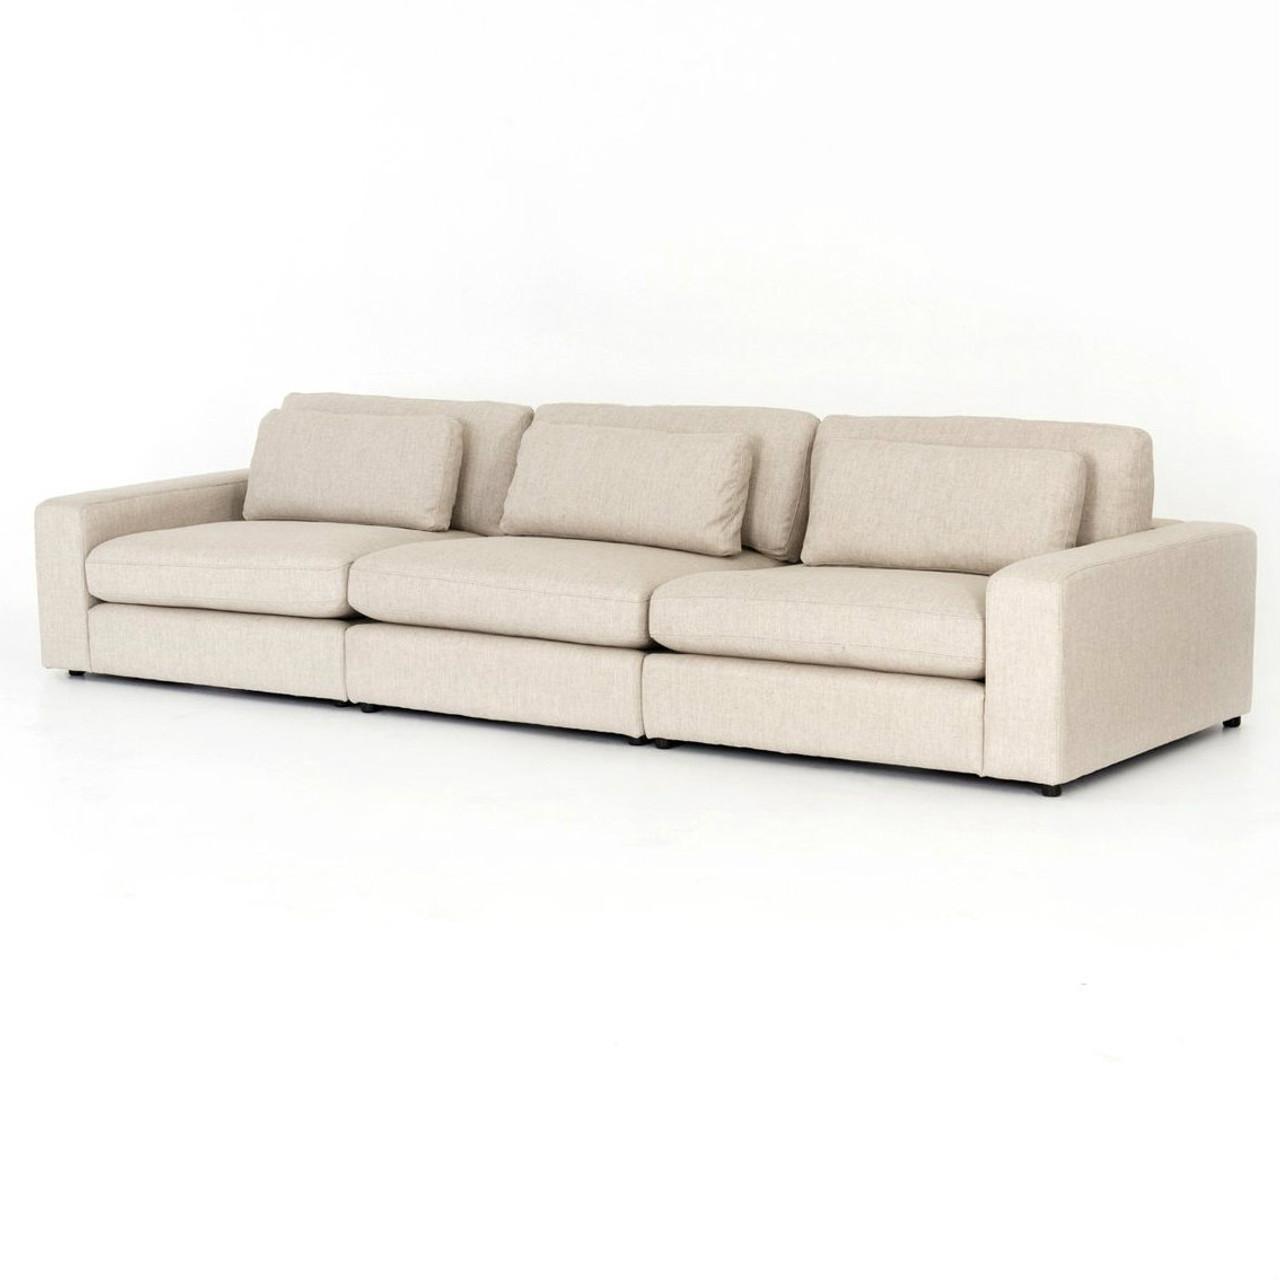 Bloor Beige Contemporary 3 Piece Modular Sofa 131